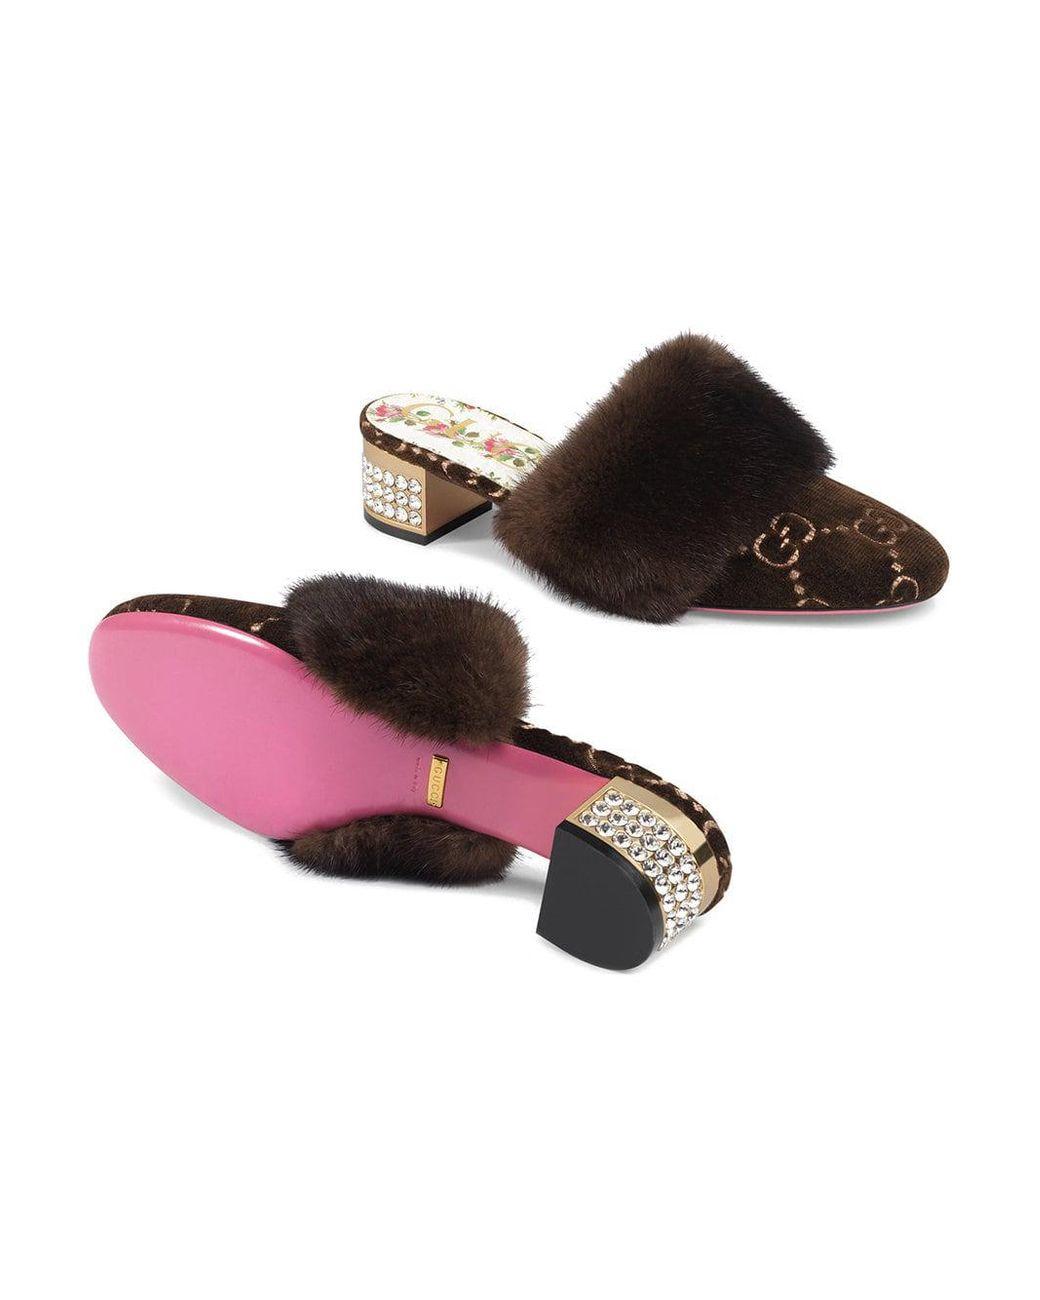 0426e416d8d5 Lyst - Gucci GG Velvet Slide With Mink Fur in Brown - Save 40%